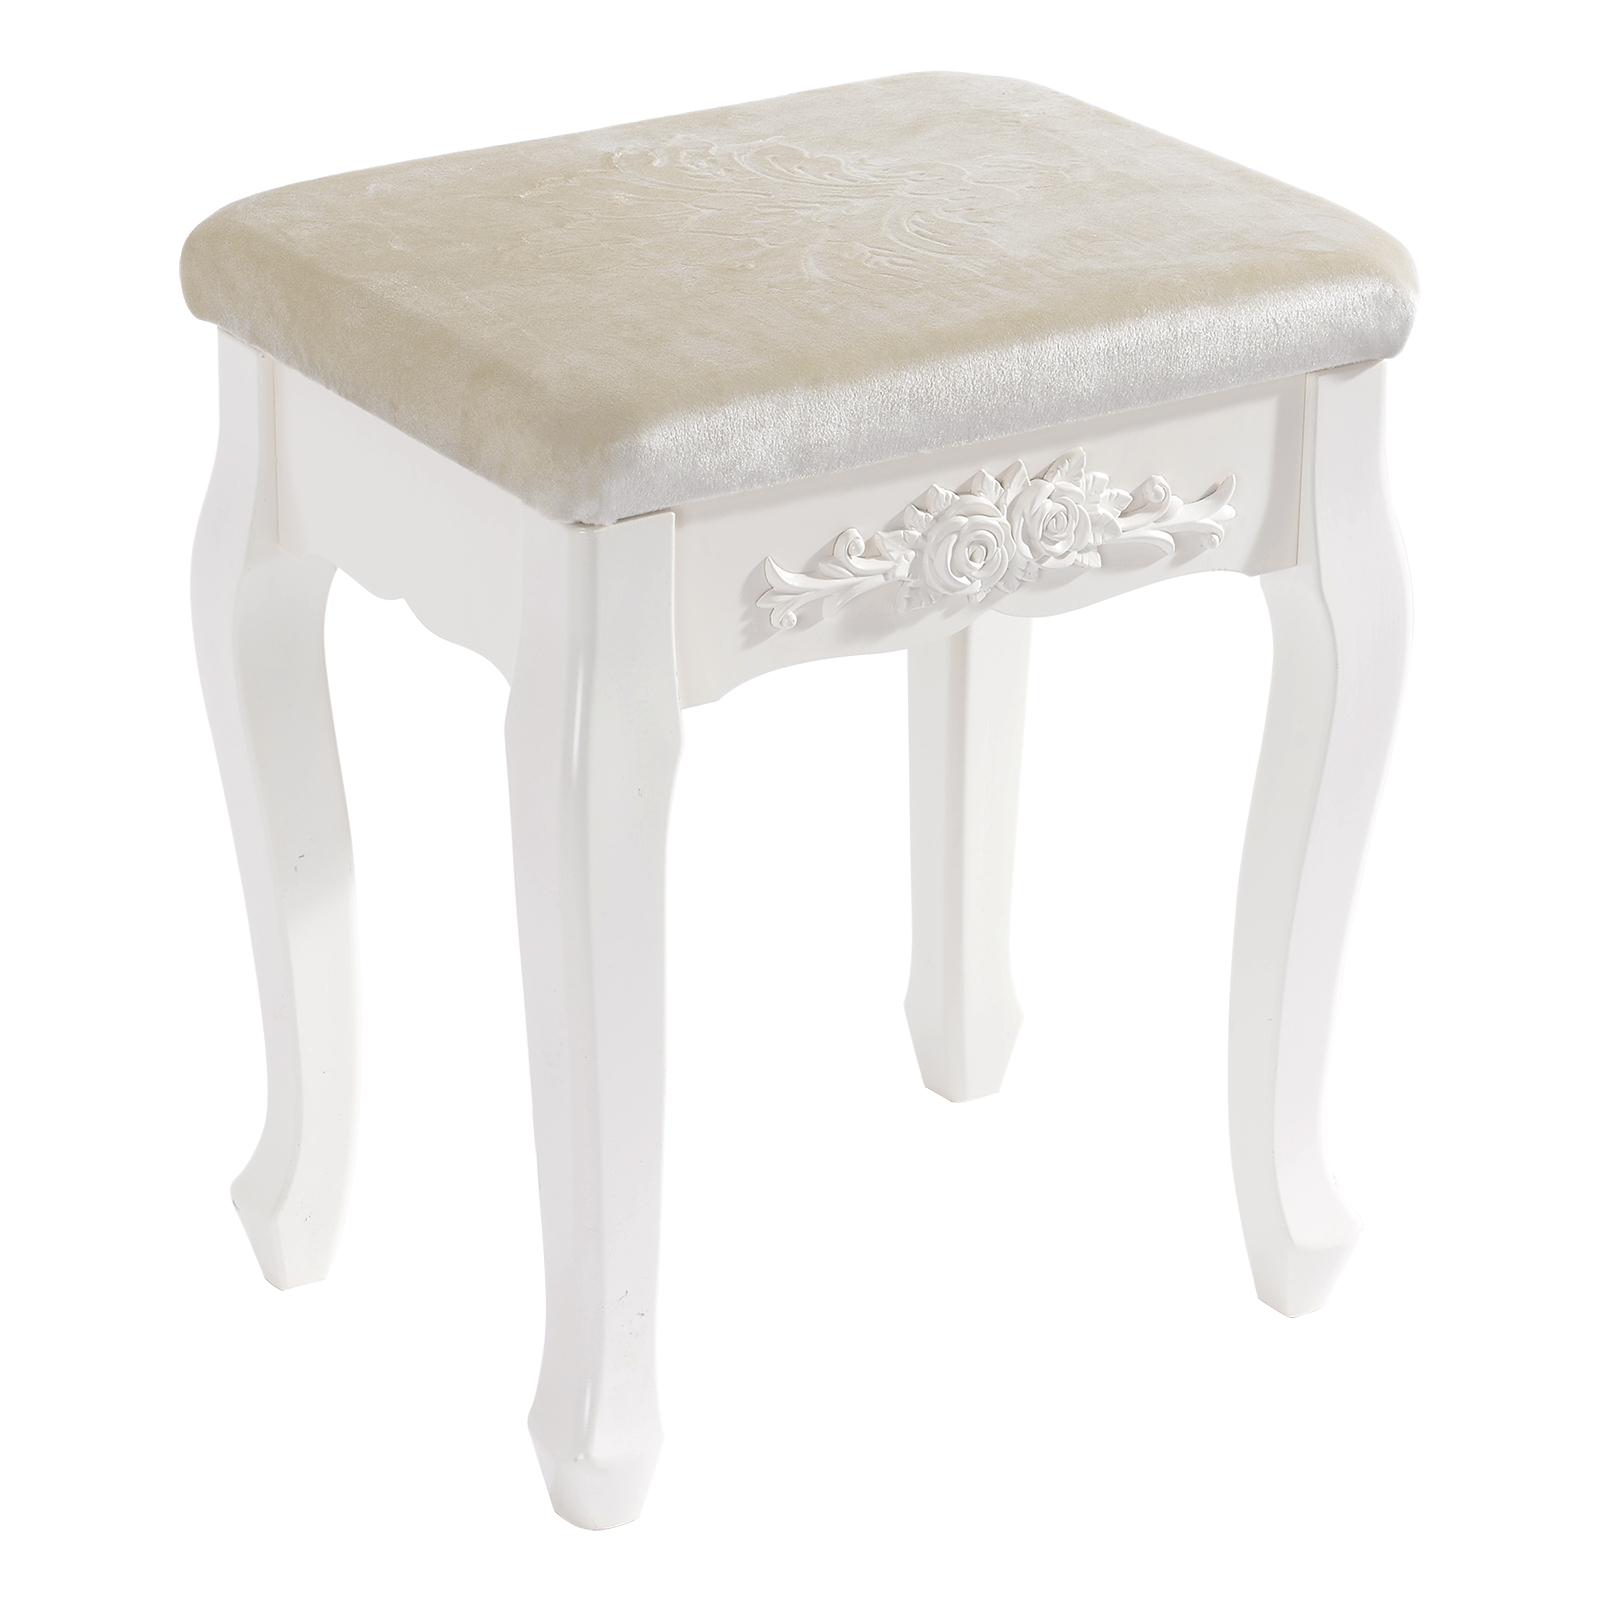 ikea hocker f r schminktisch. Black Bedroom Furniture Sets. Home Design Ideas